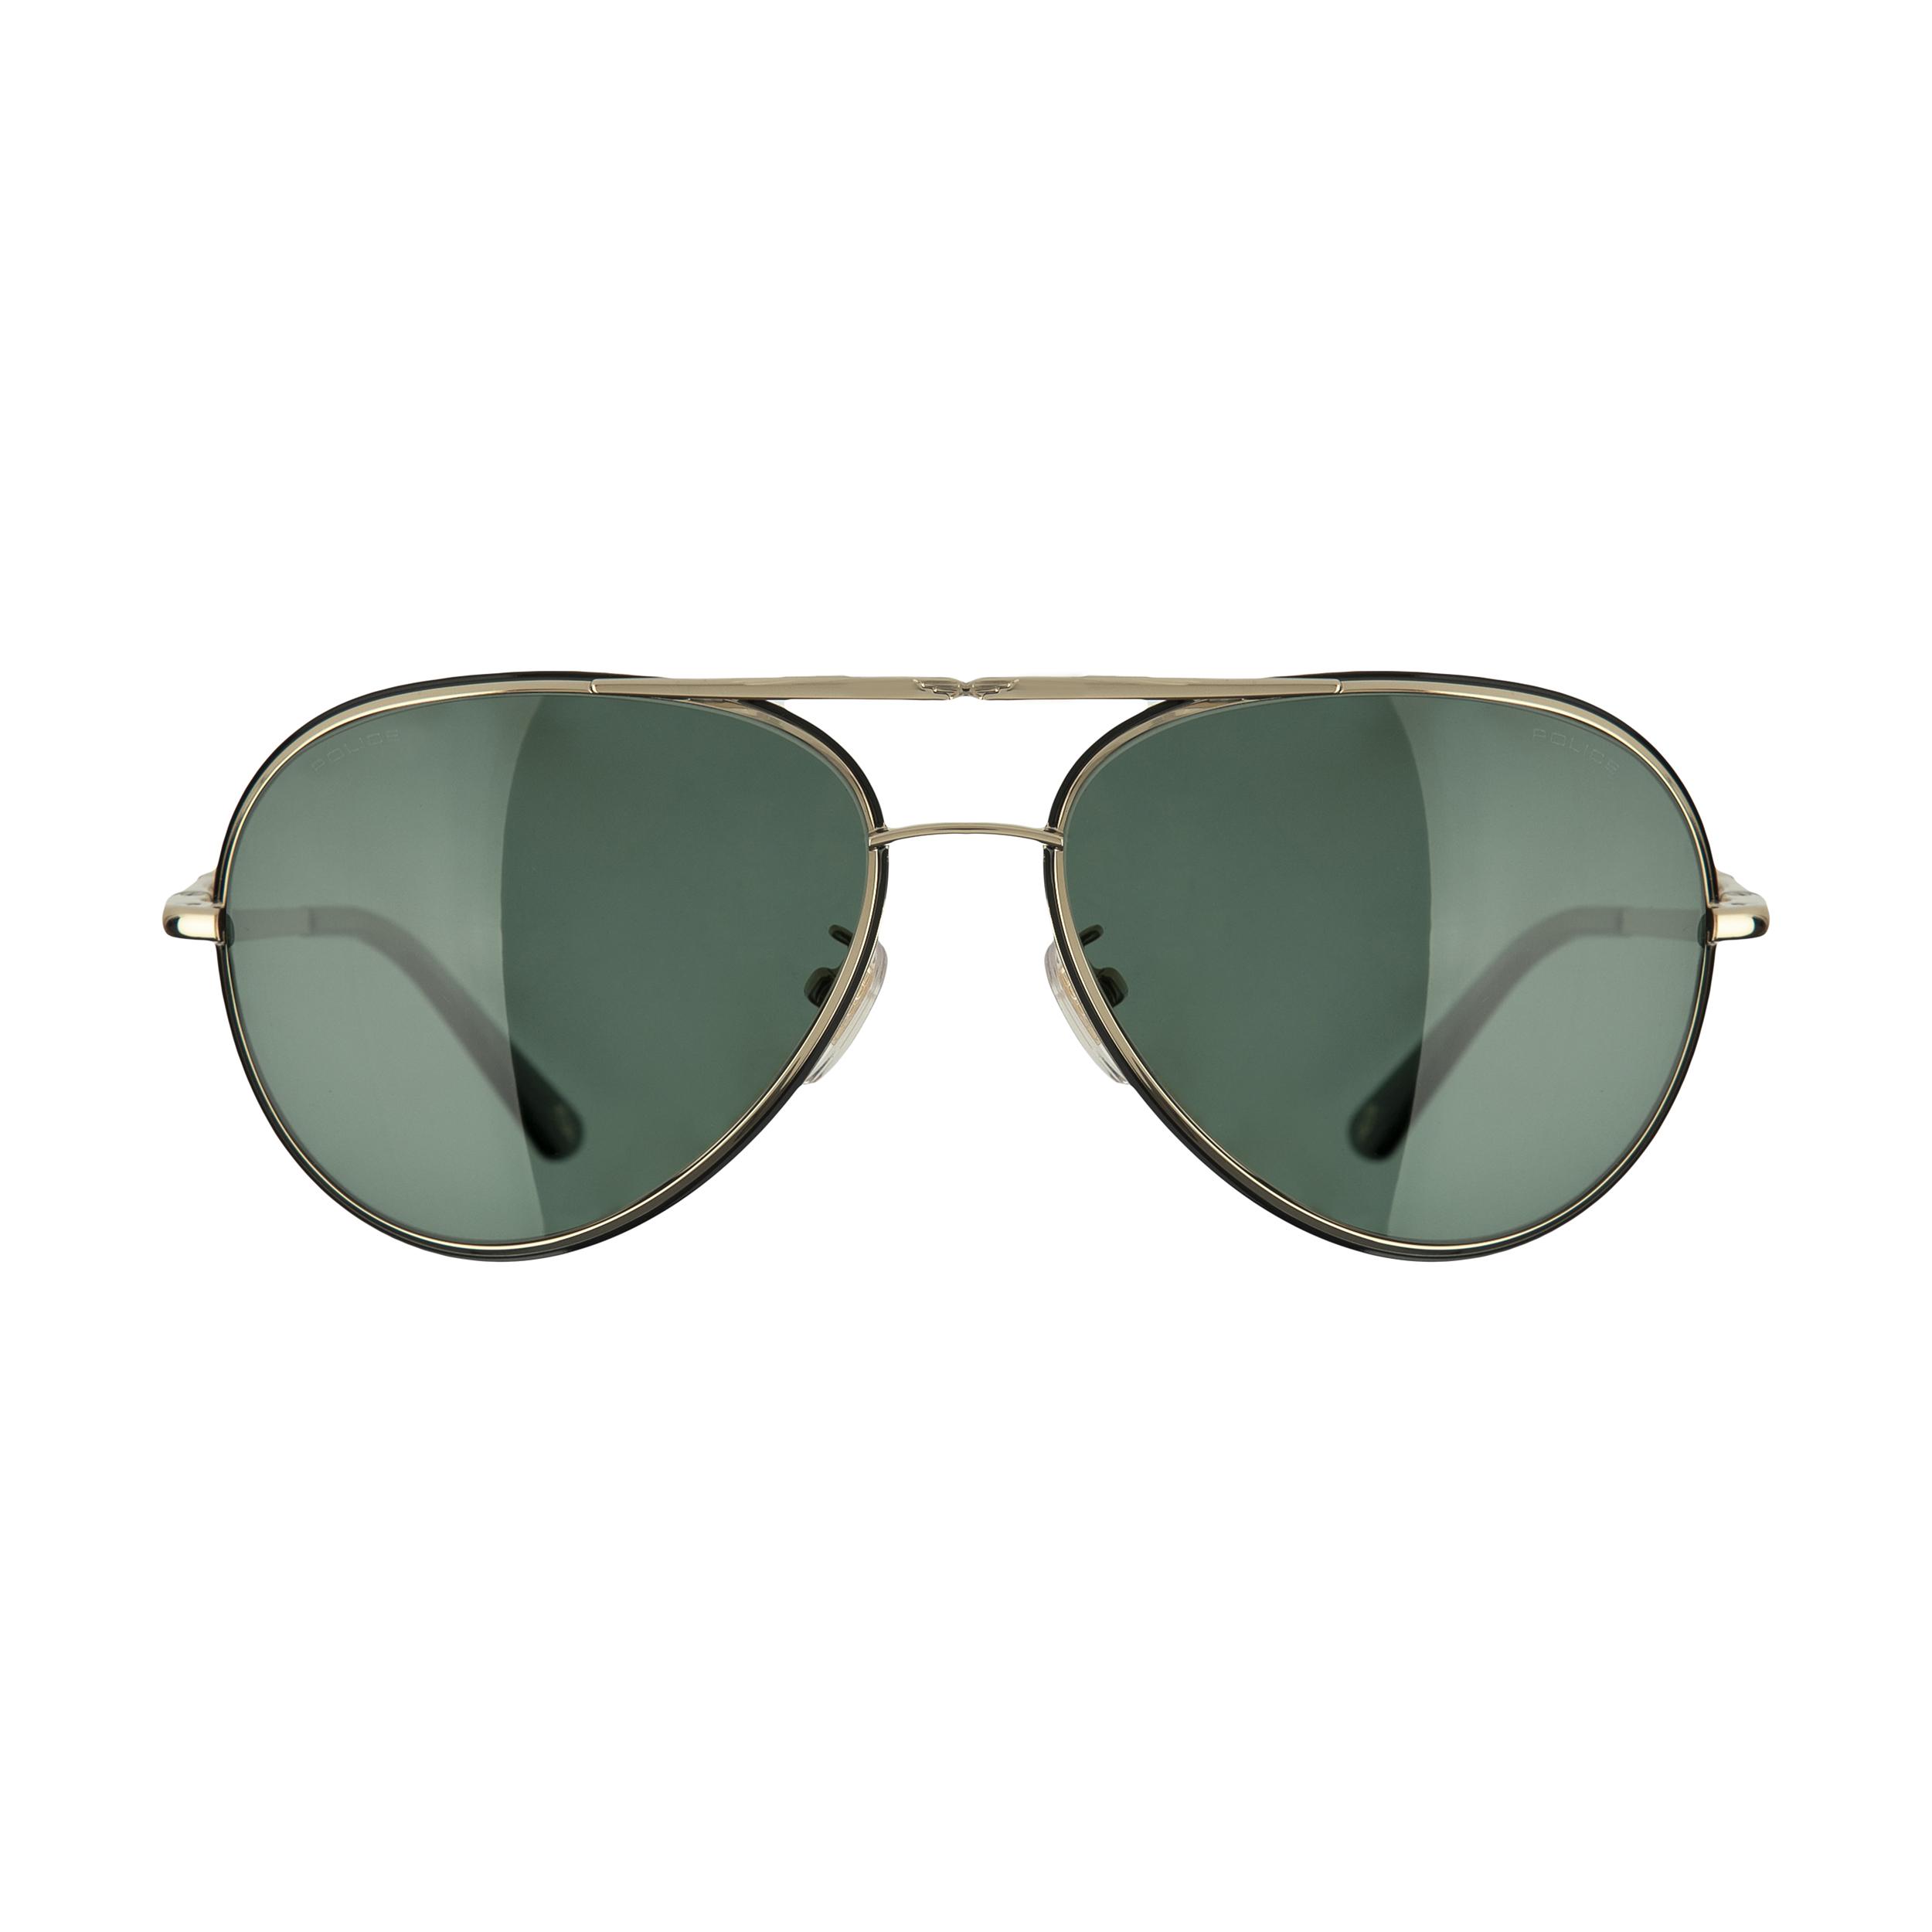 عینک آفتابی مردانه پلیس مدل SPL966N 301P